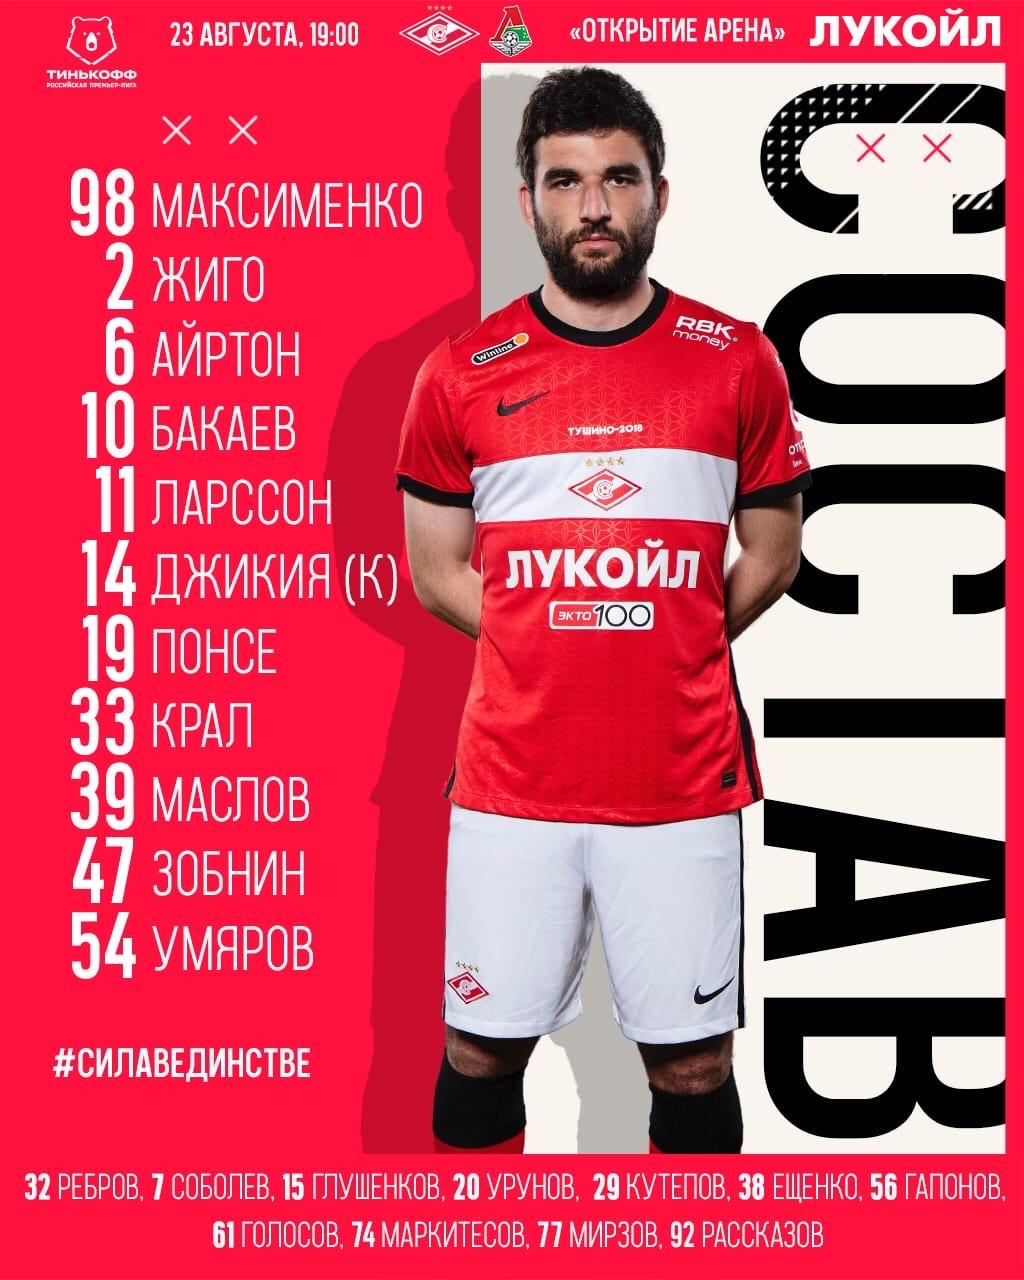 Состав «Спартака» на матч 4-го тура с «Локомотивом»